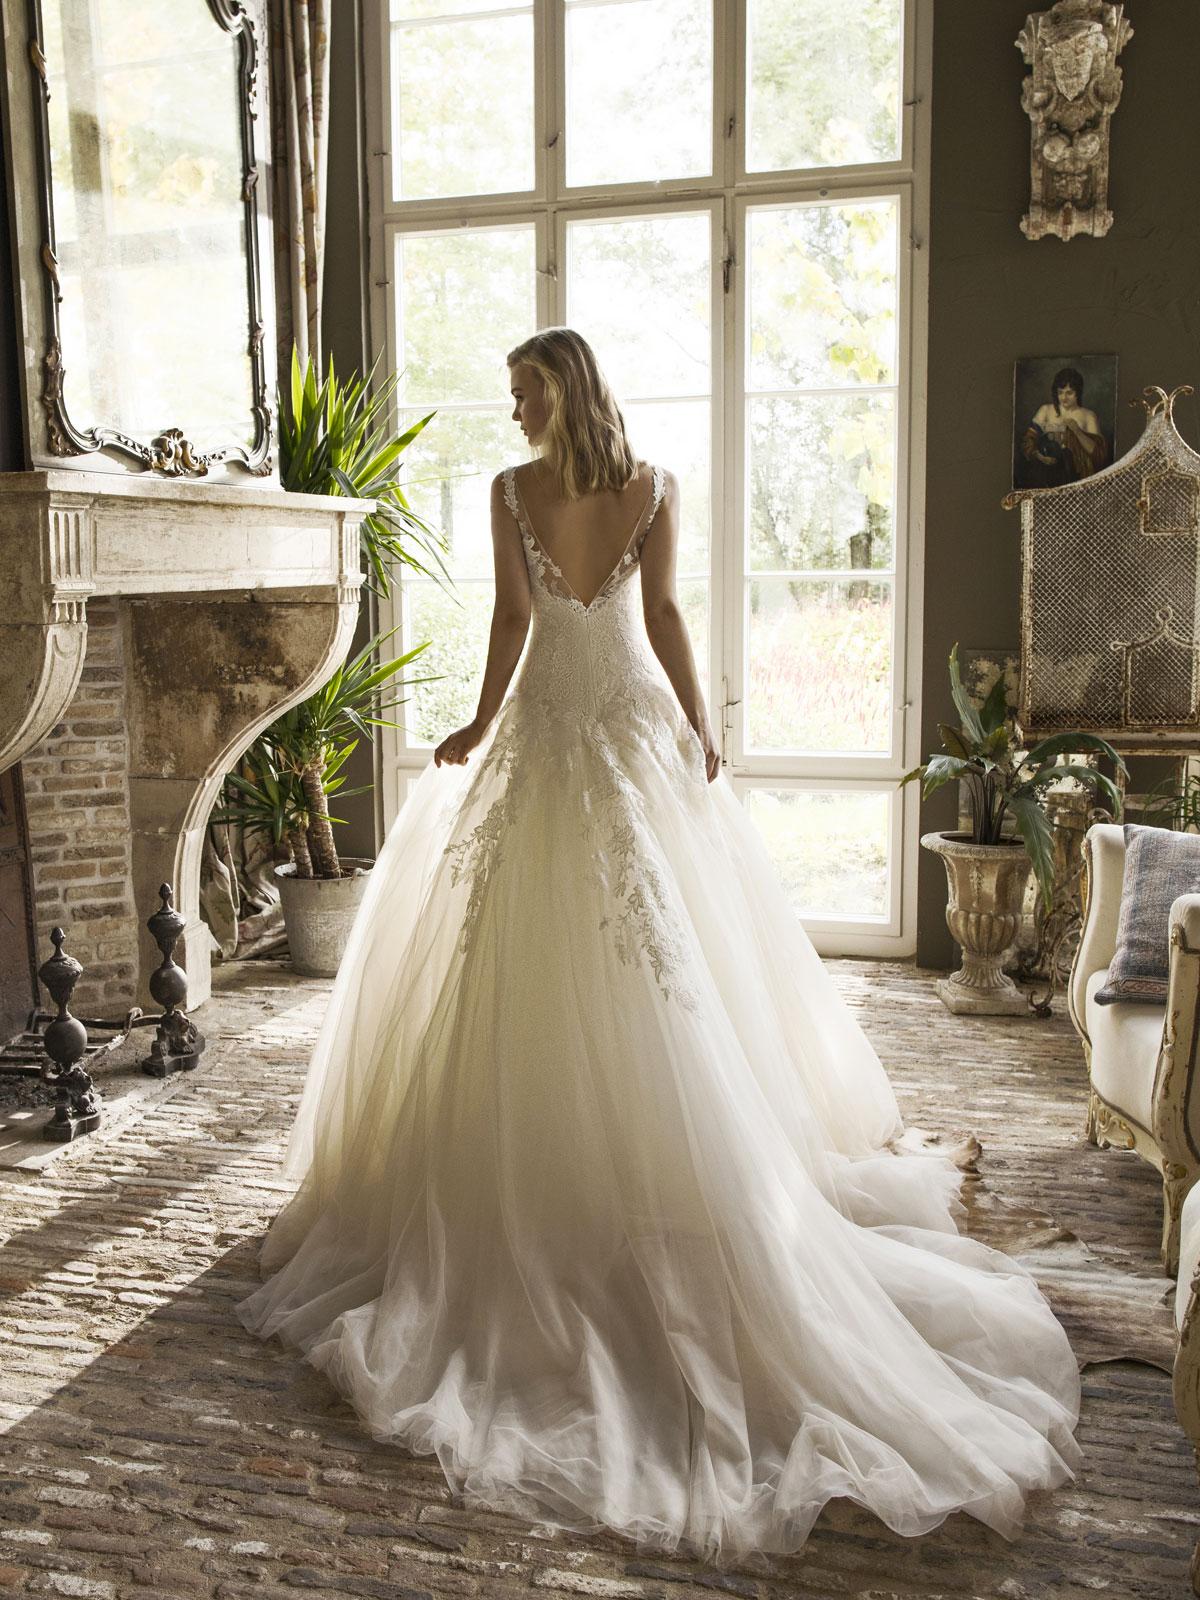 Robe de mariée princesse Dijon par Modeca